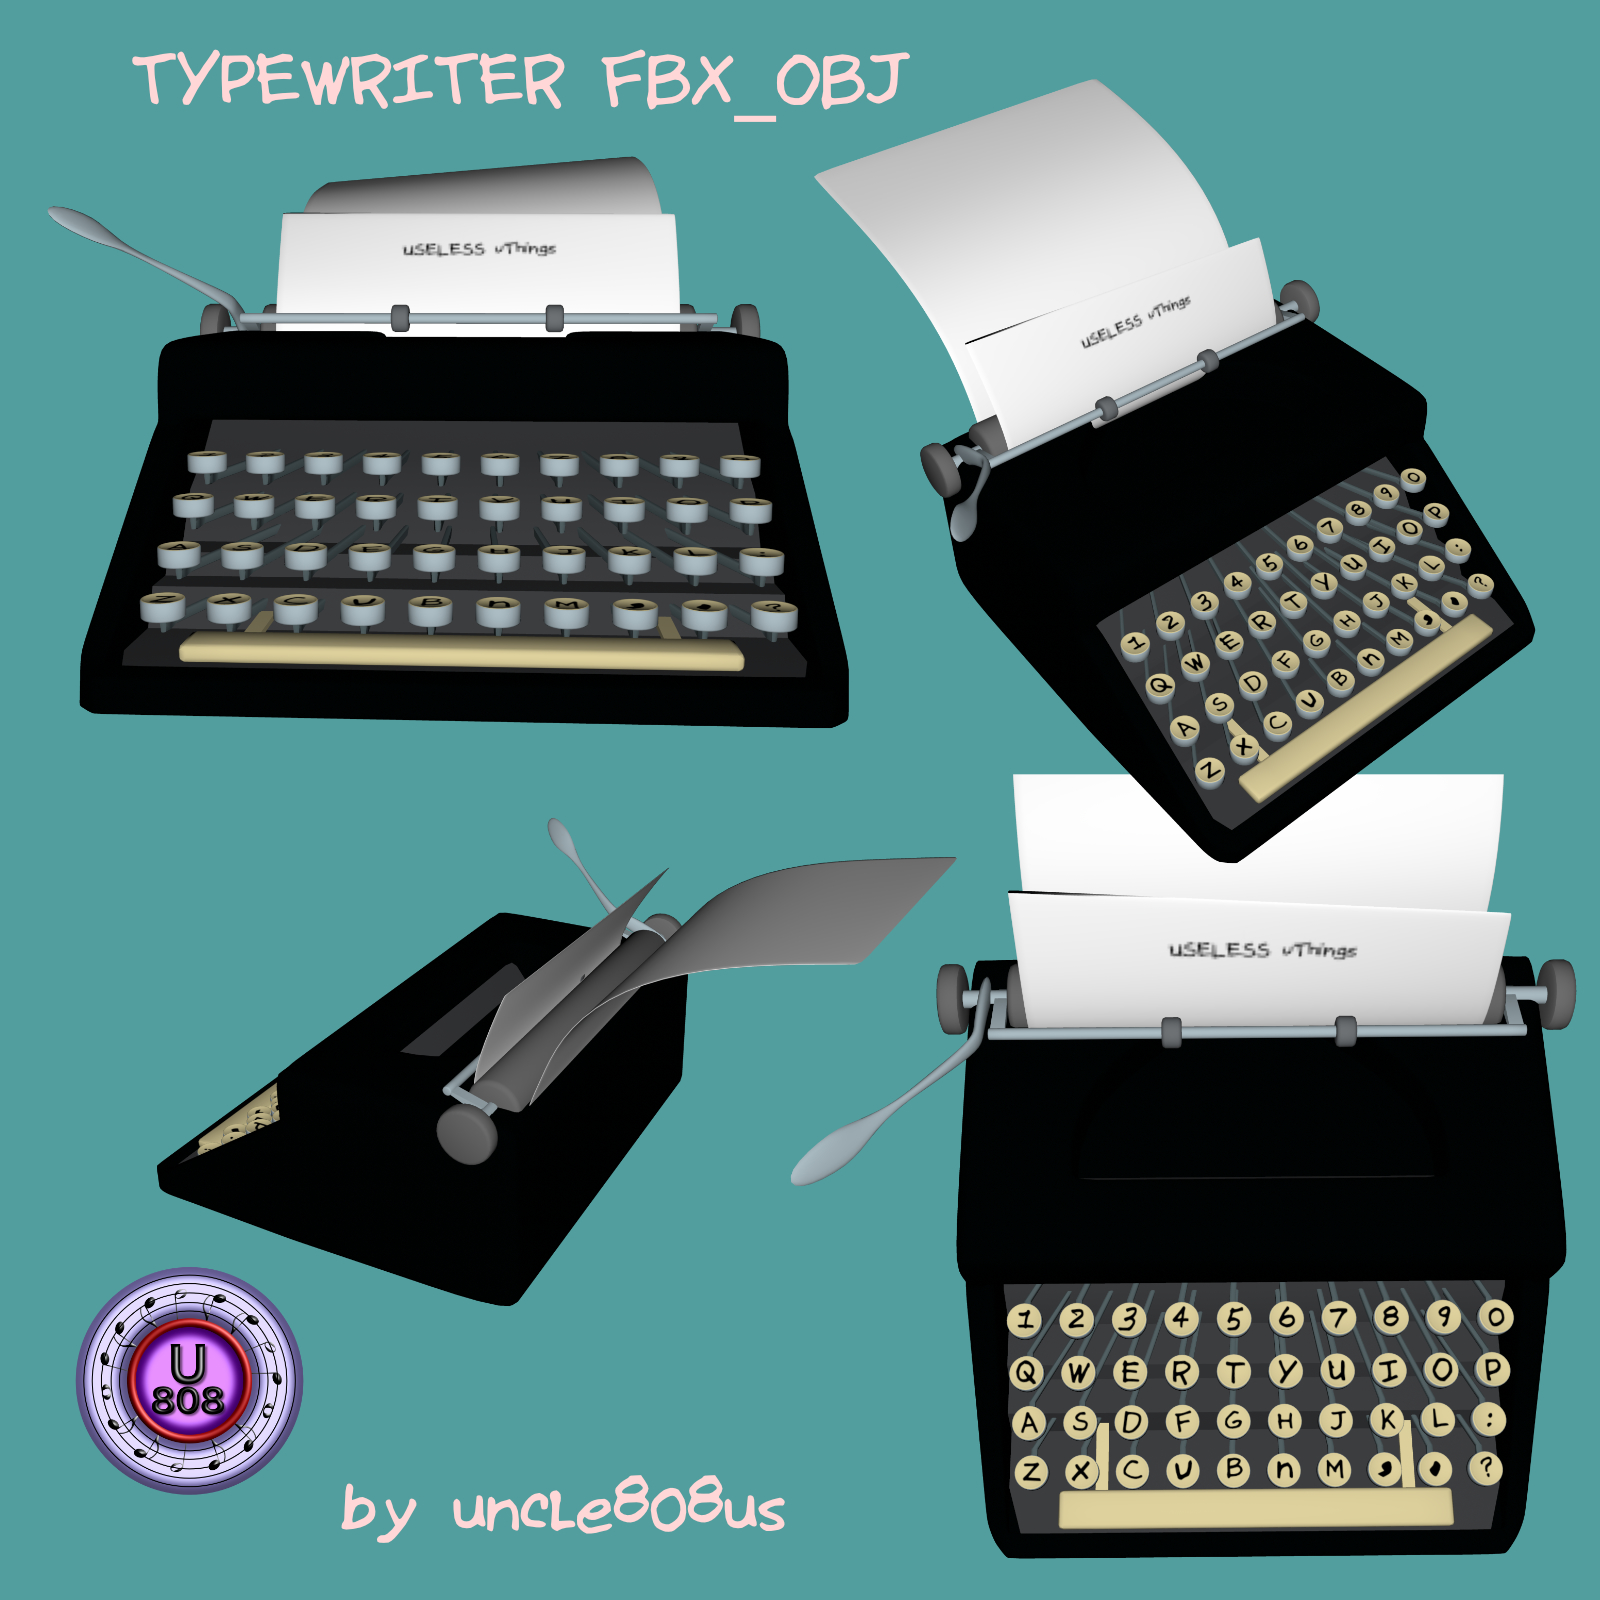 typewriter_old fbx obj 3d загвар fbx 264970